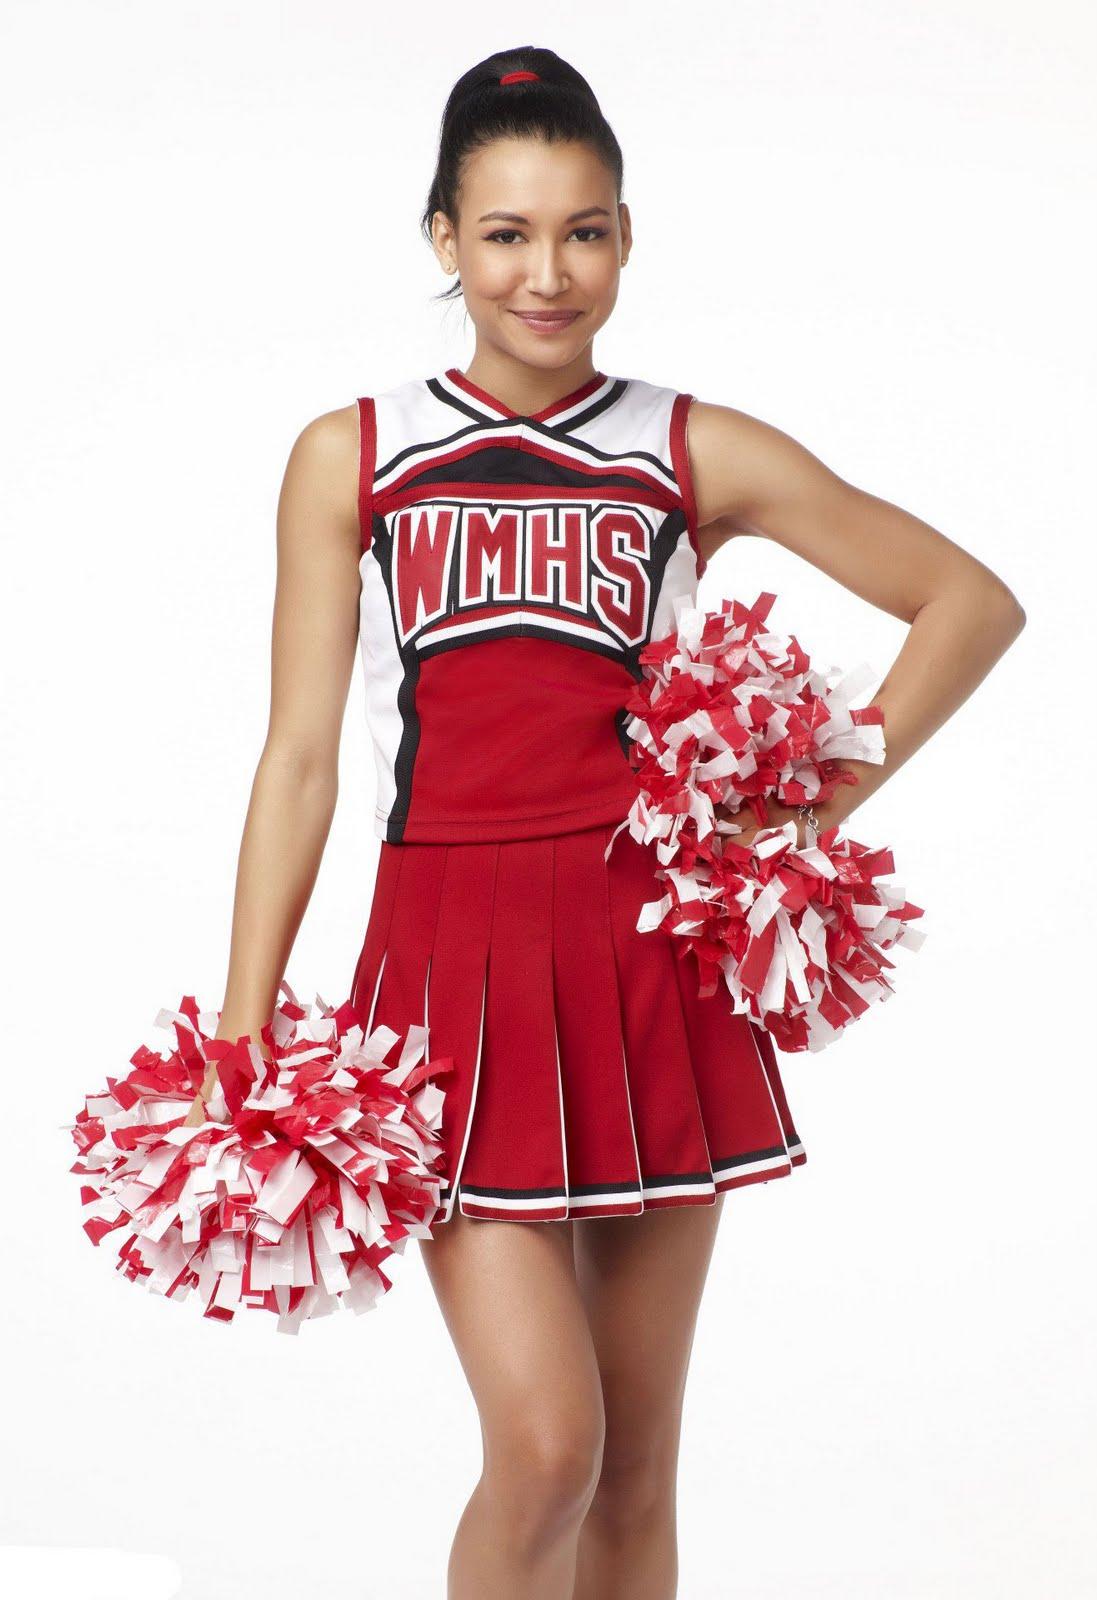 Glee - Santana